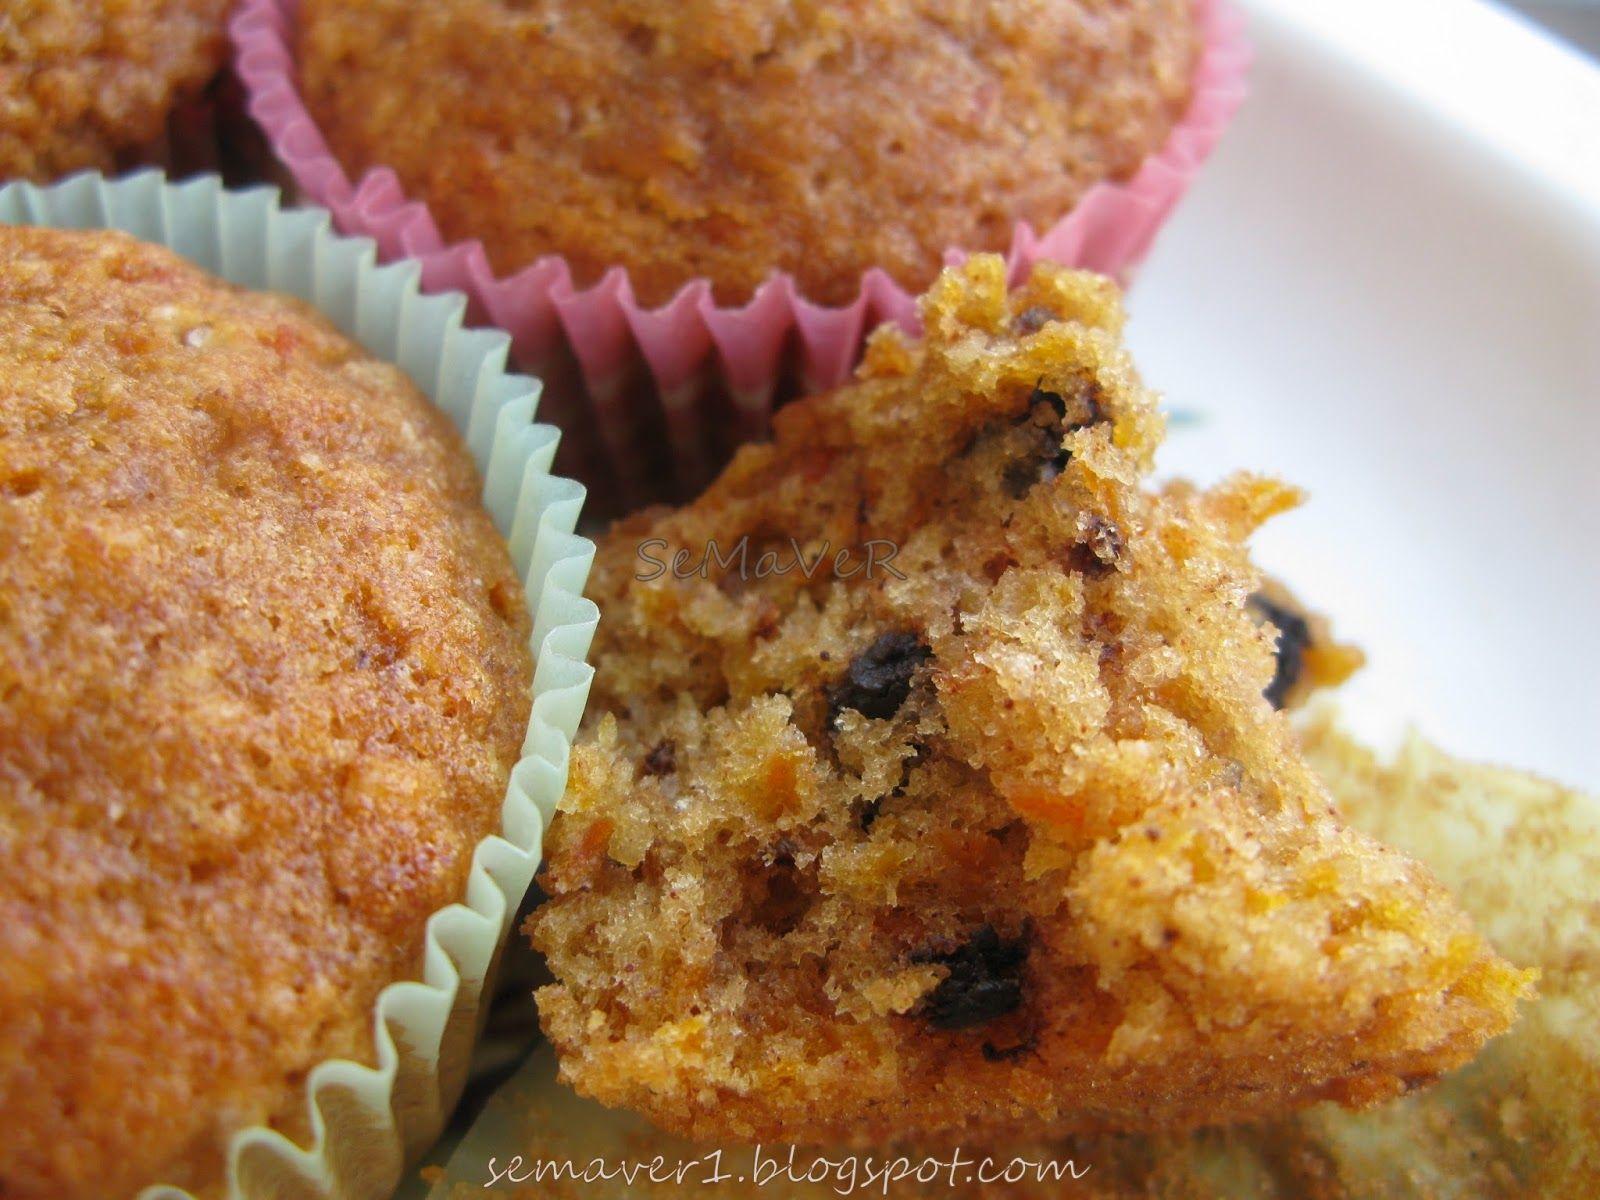 Mısır Unlu Kabaklı Muffin